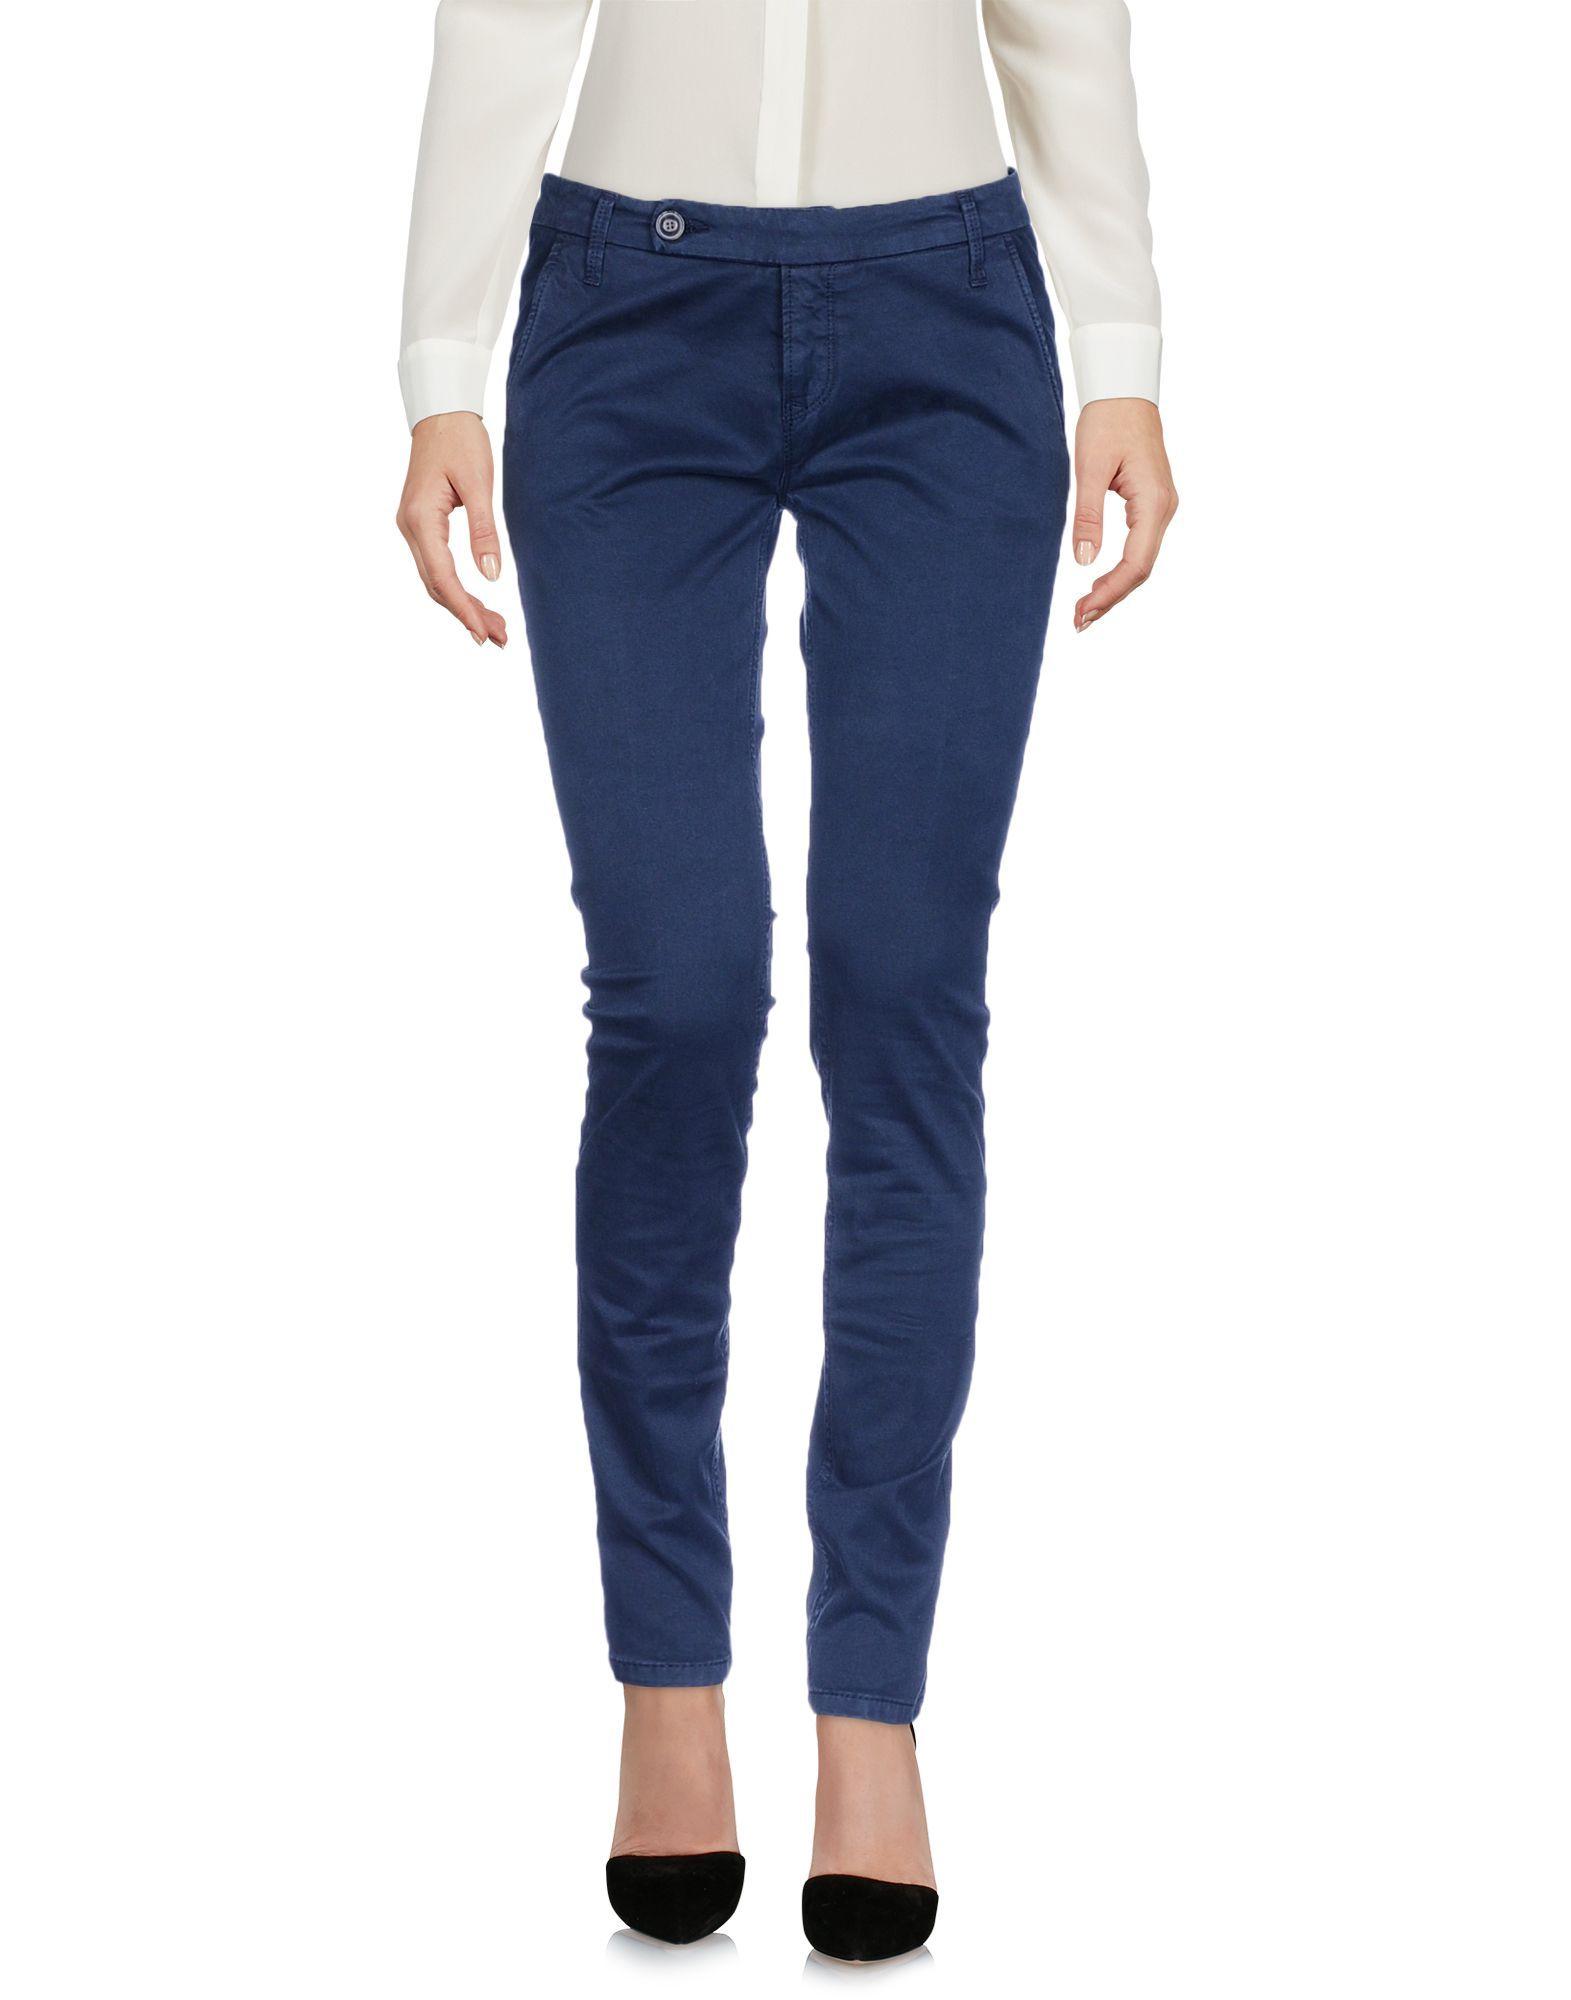 True Nyc� Dark Blue Cotton Tapered Leg Trousers